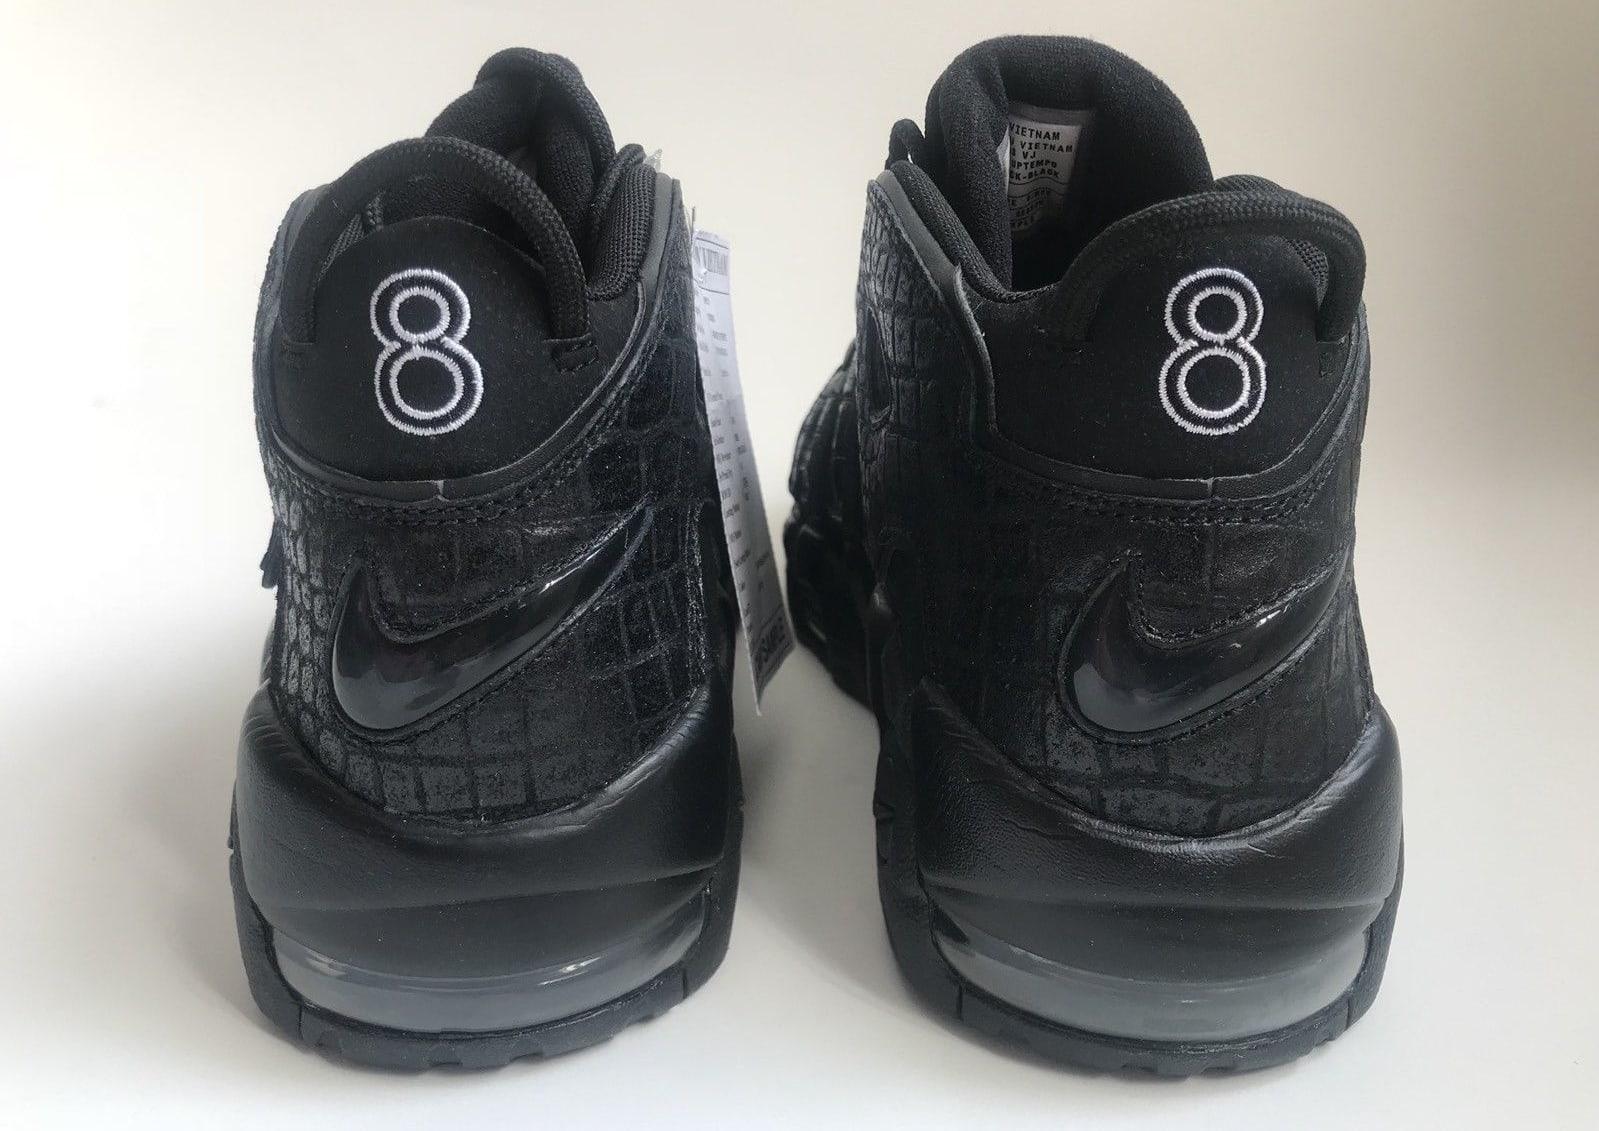 Nike Air More Uptempo 'Croc' Sample (Heel)